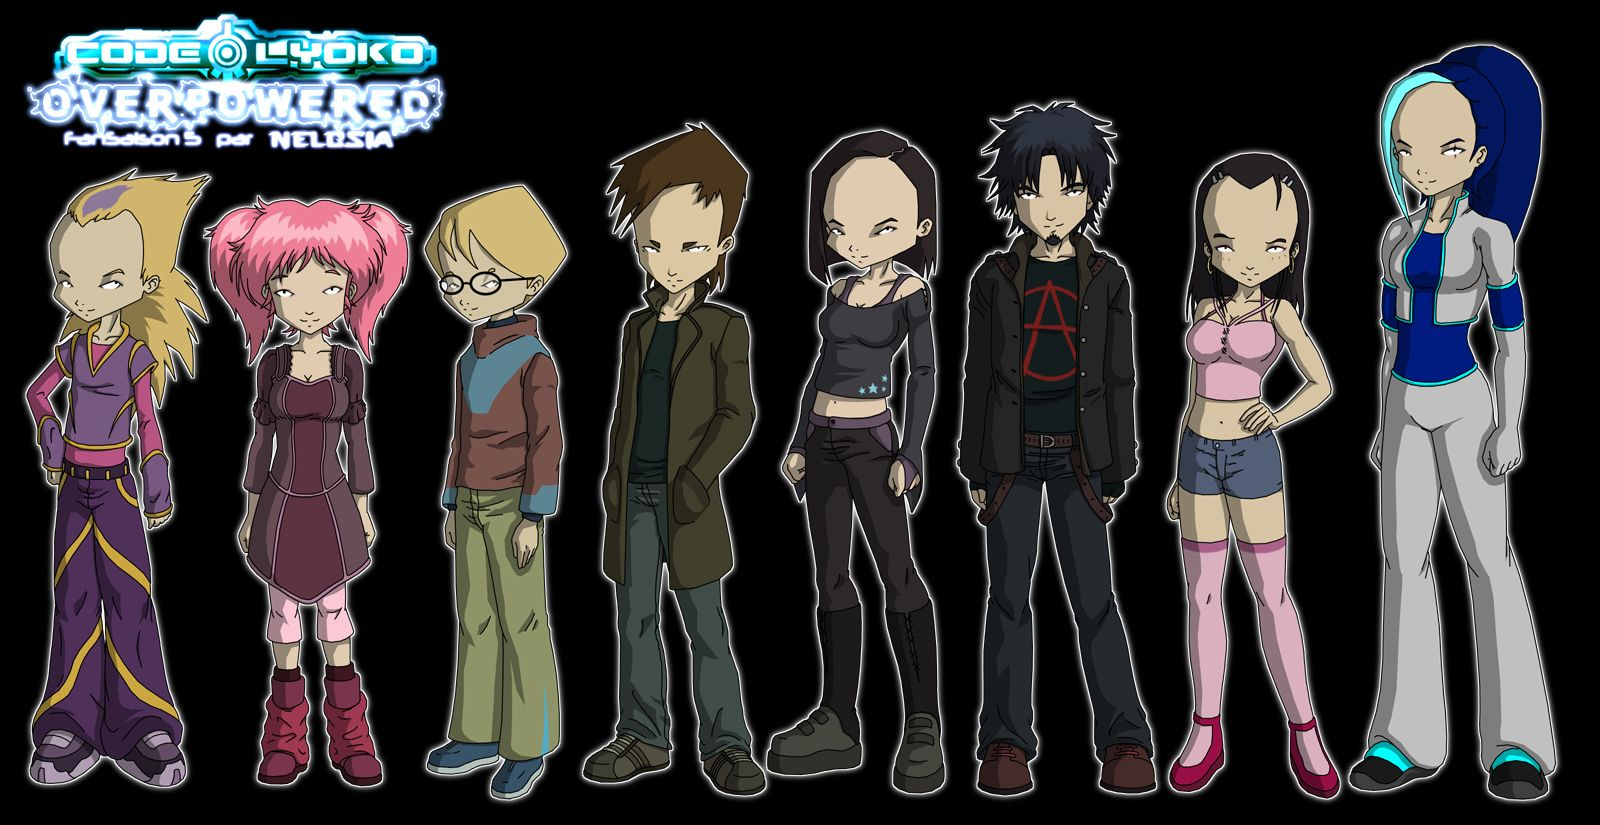 """Code Lyoko Overpowered"" is a fancreated ""fifth season"